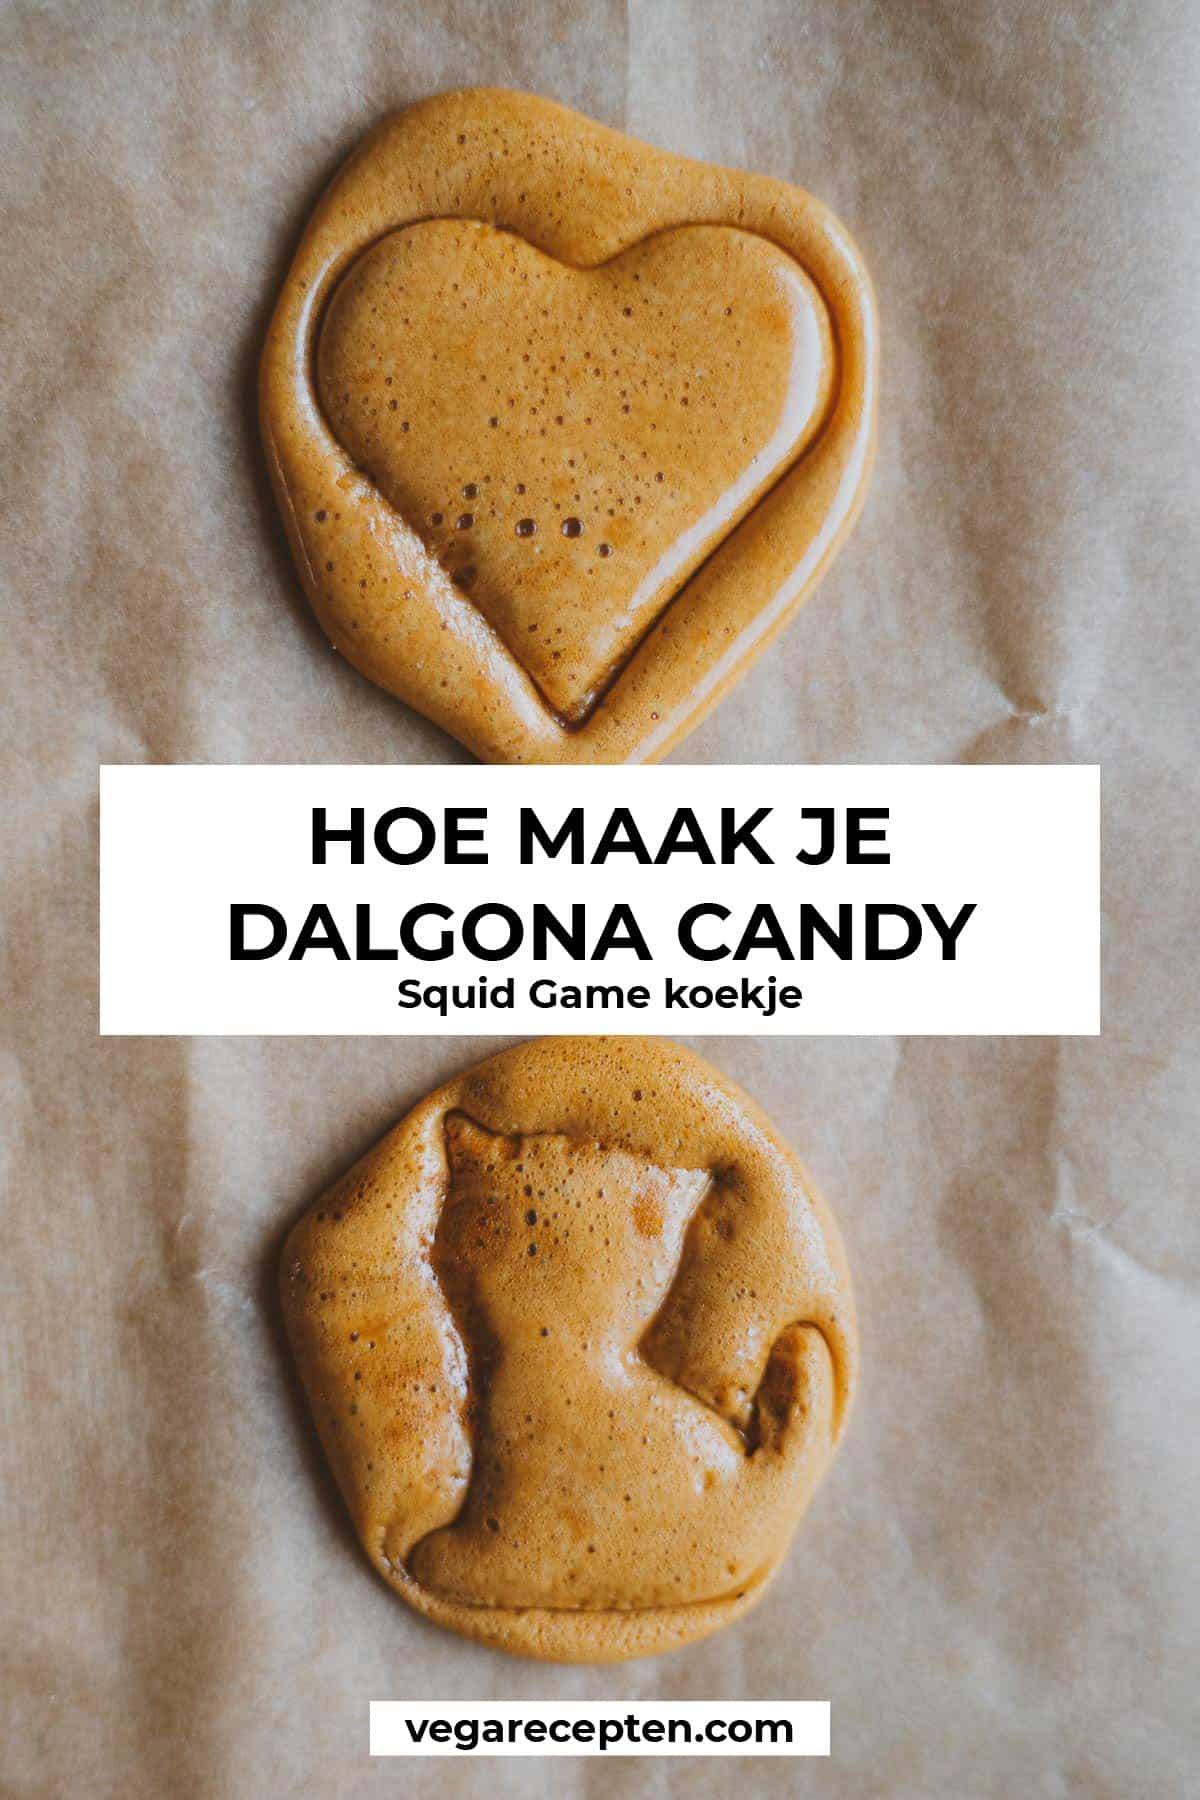 Hoe maak je dalgona candy squid game koekje recept